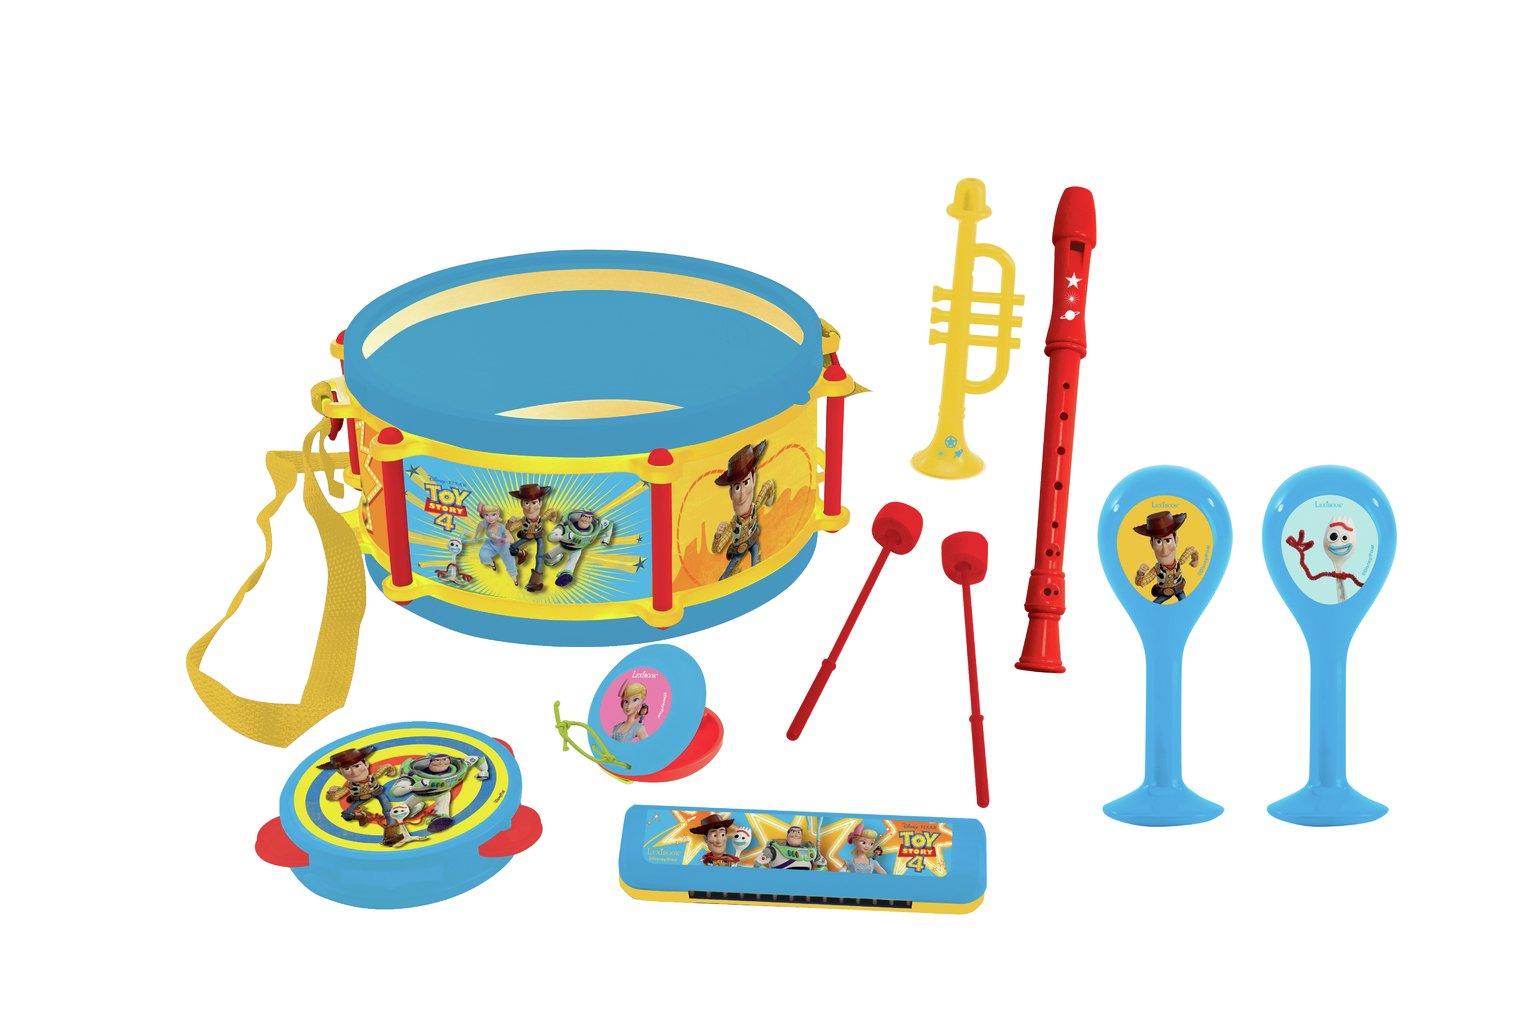 Toy Story Music Set